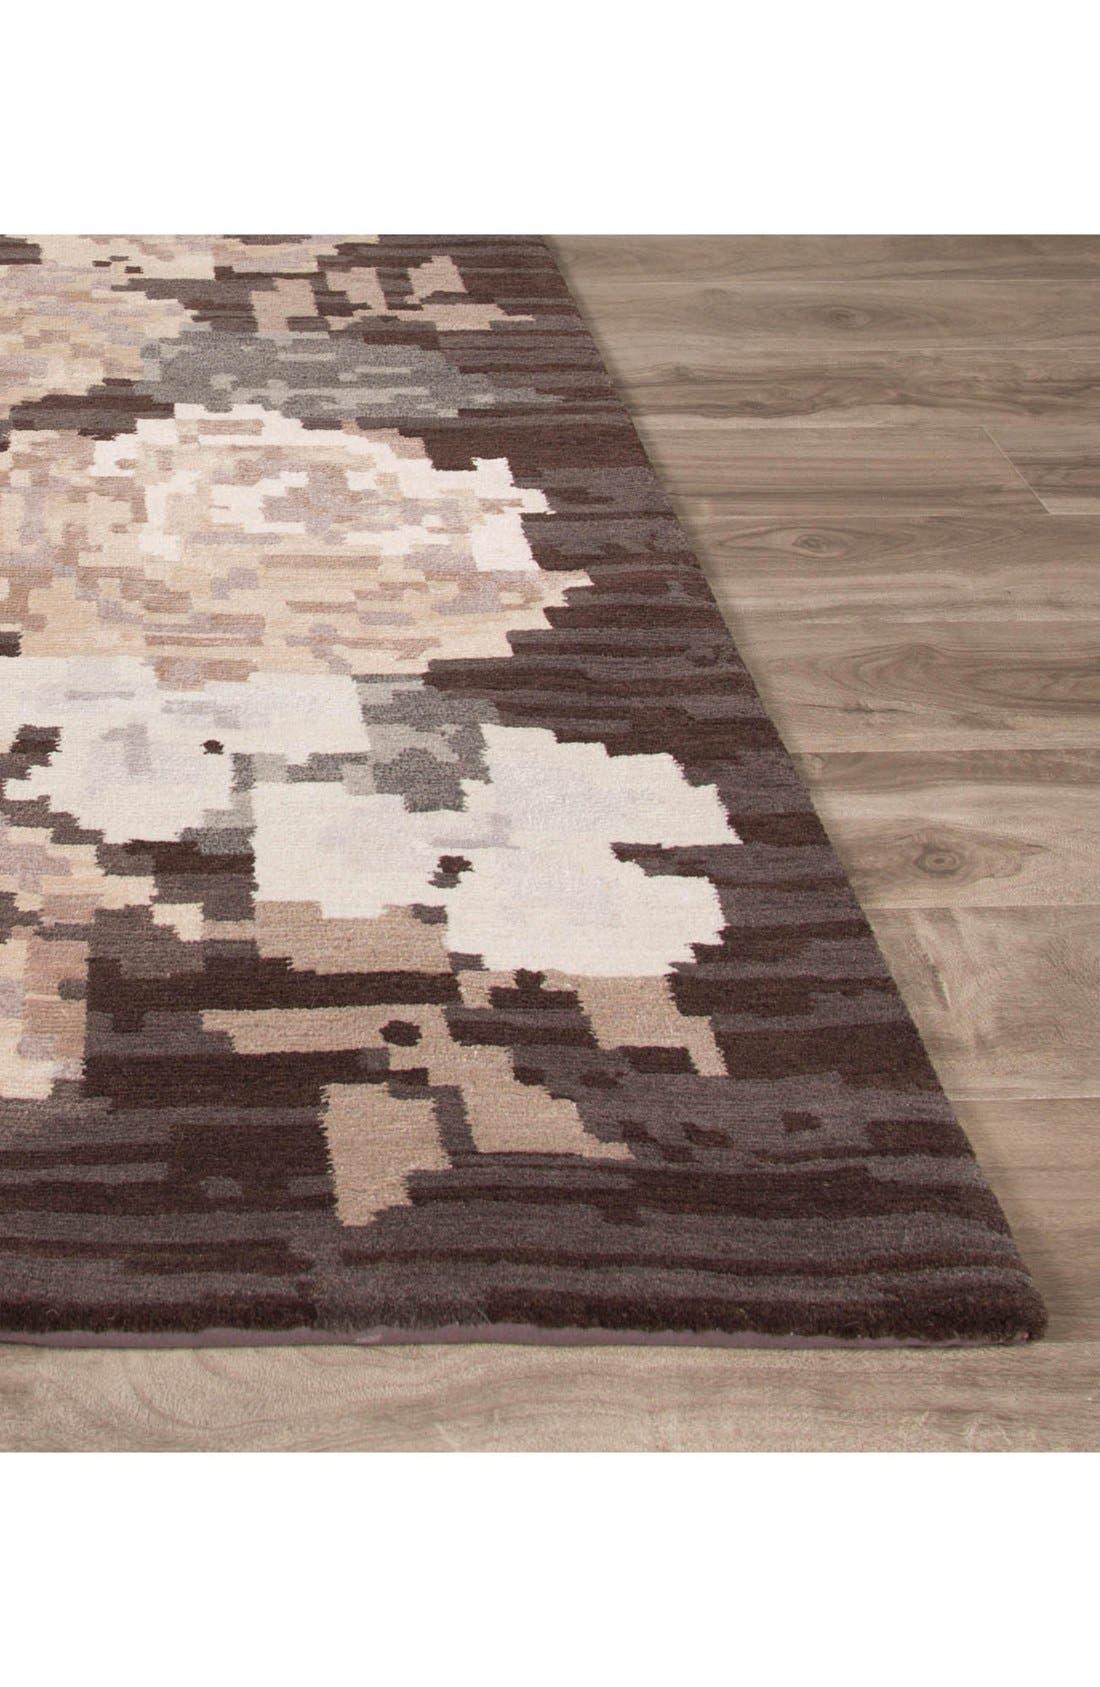 'murray - floral pattern' wool blend rug,                             Alternate thumbnail 2, color,                             200